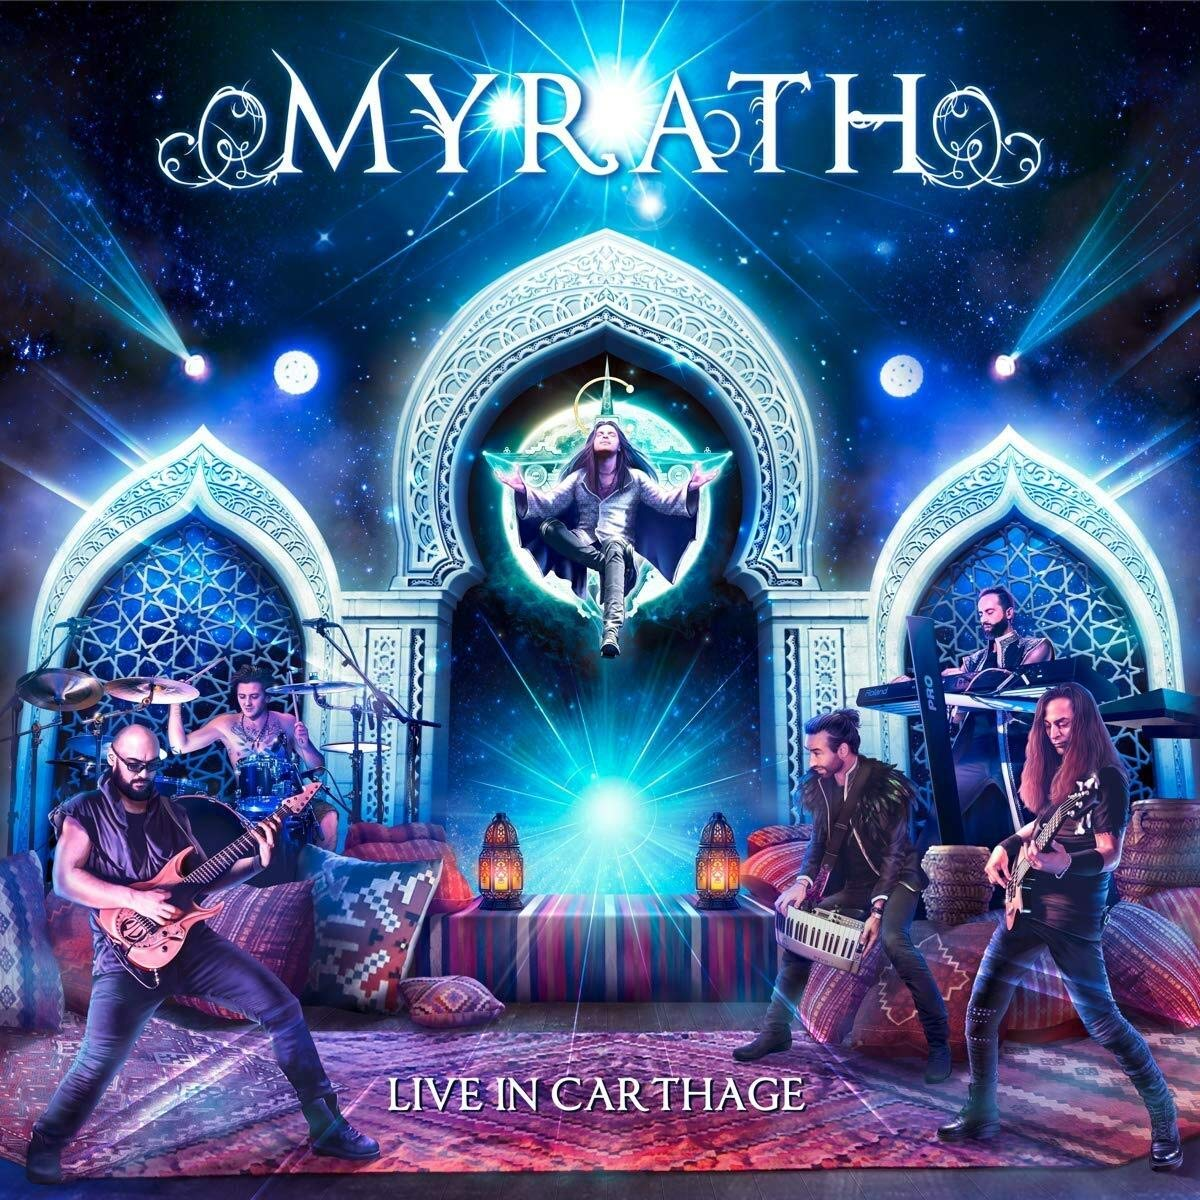 Myrath - Live In Carthage (2020) [FLAC] Download